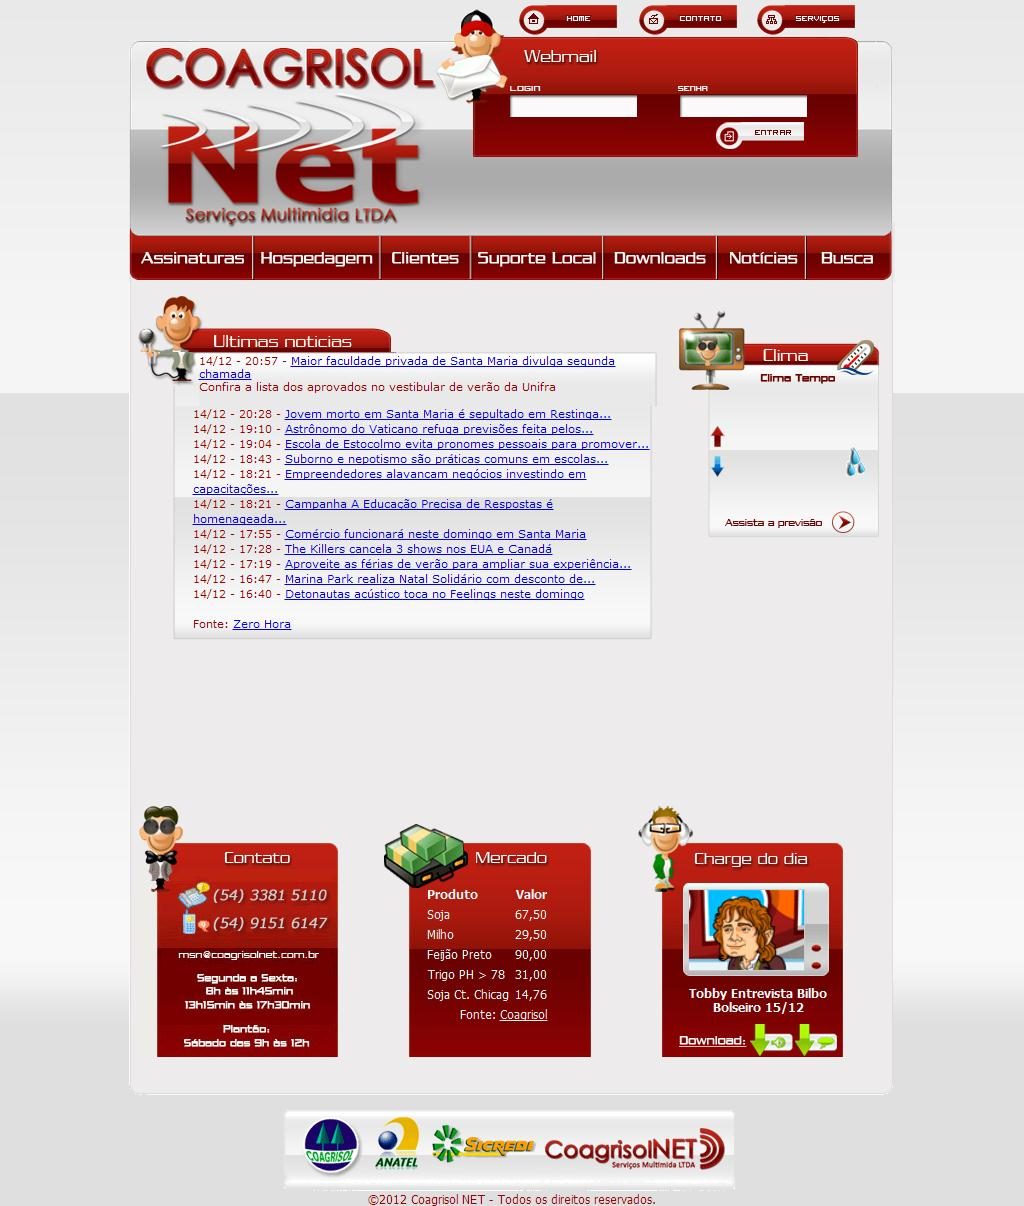 Coagrisol NET Serviços Multimídia LTDA